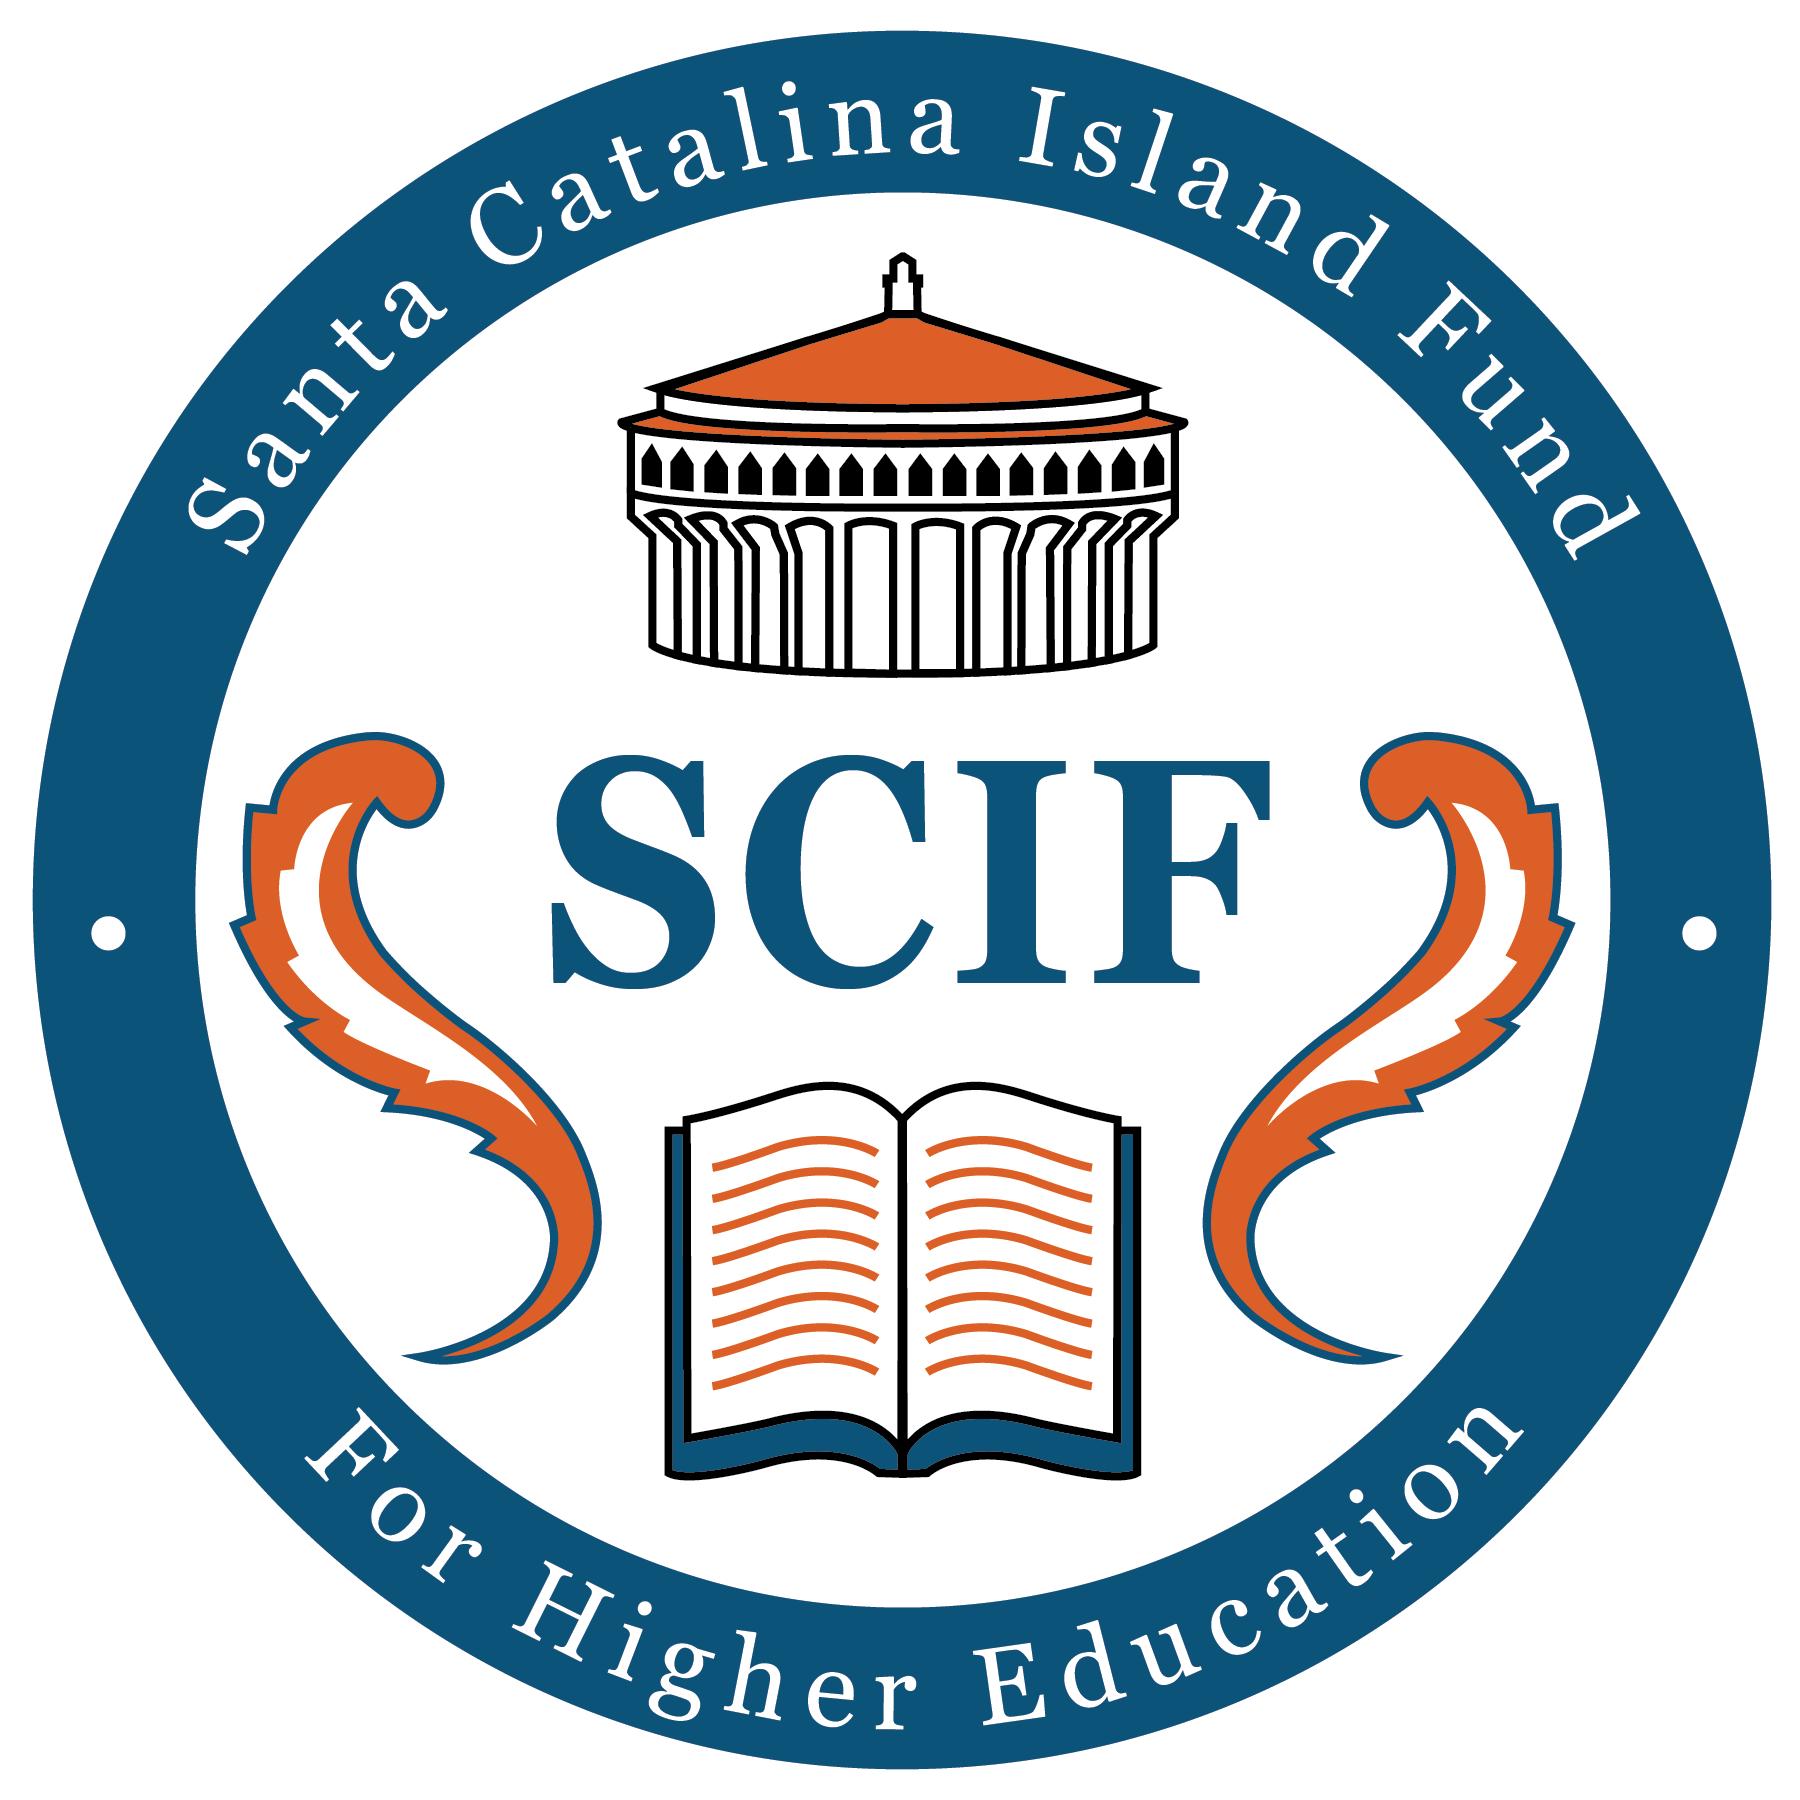 Tired clipart school fund. Scif santa catalina island